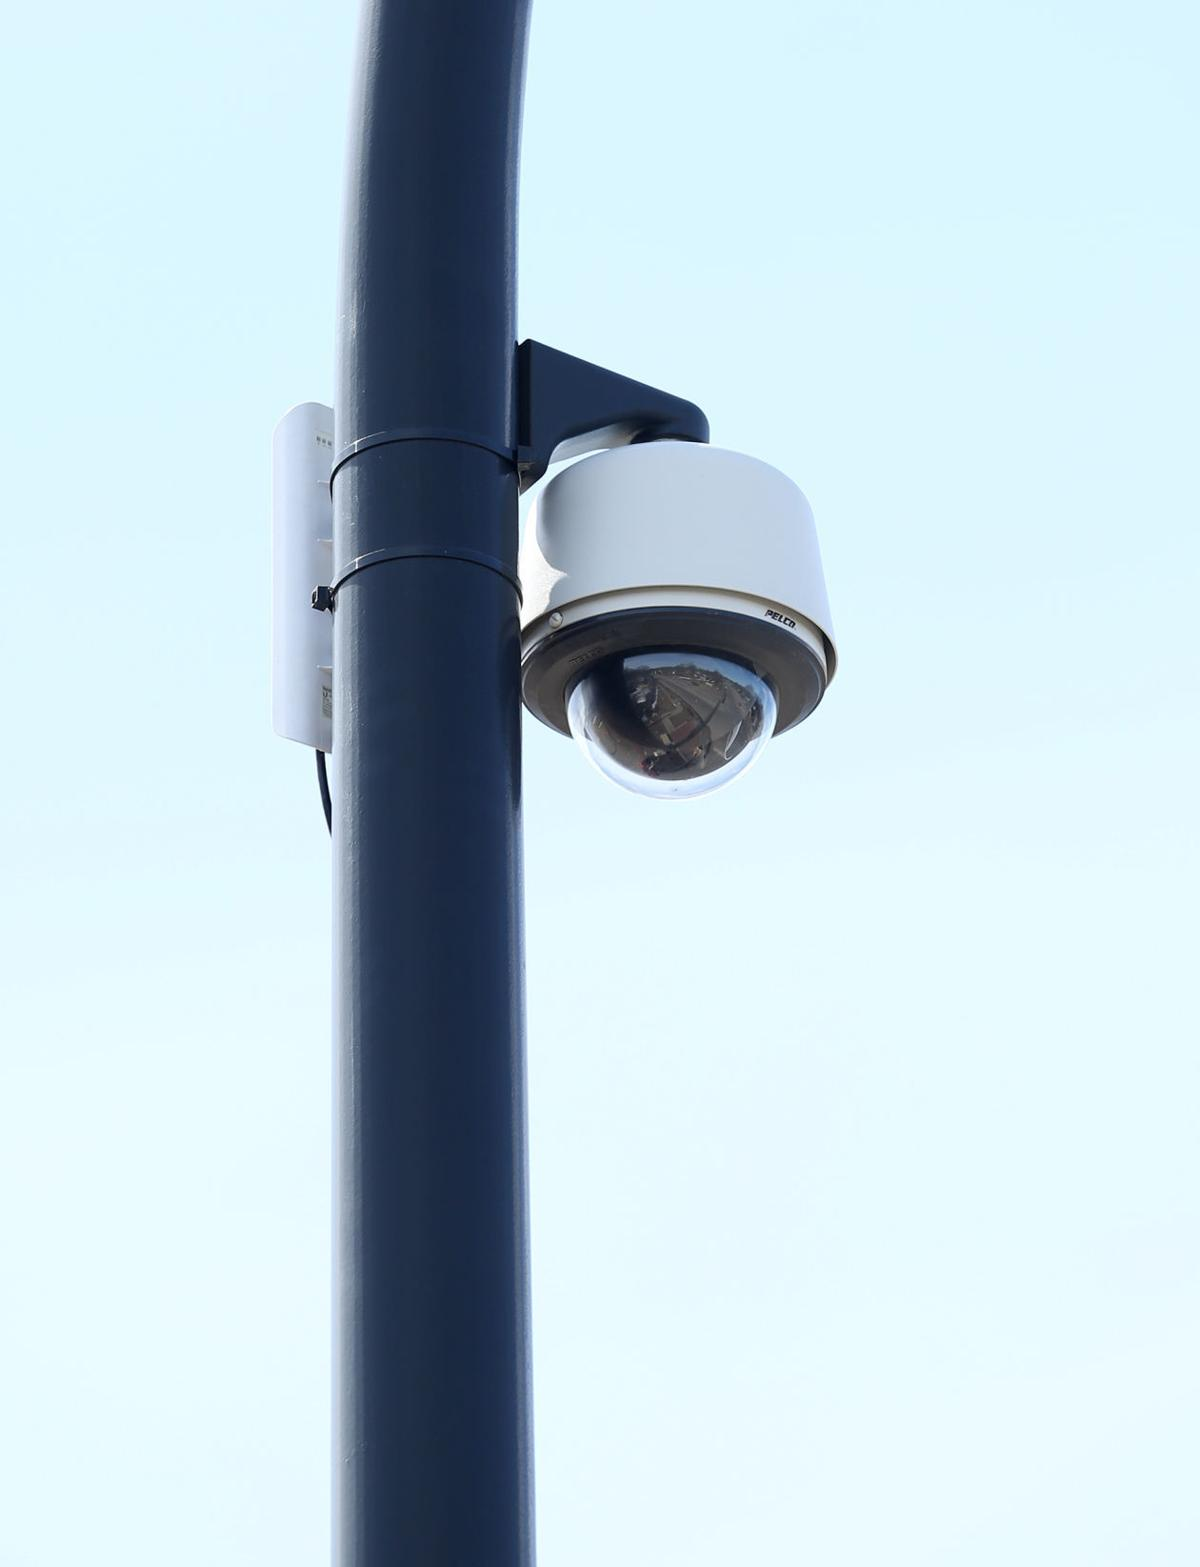 032918bp-traffic-camera-1